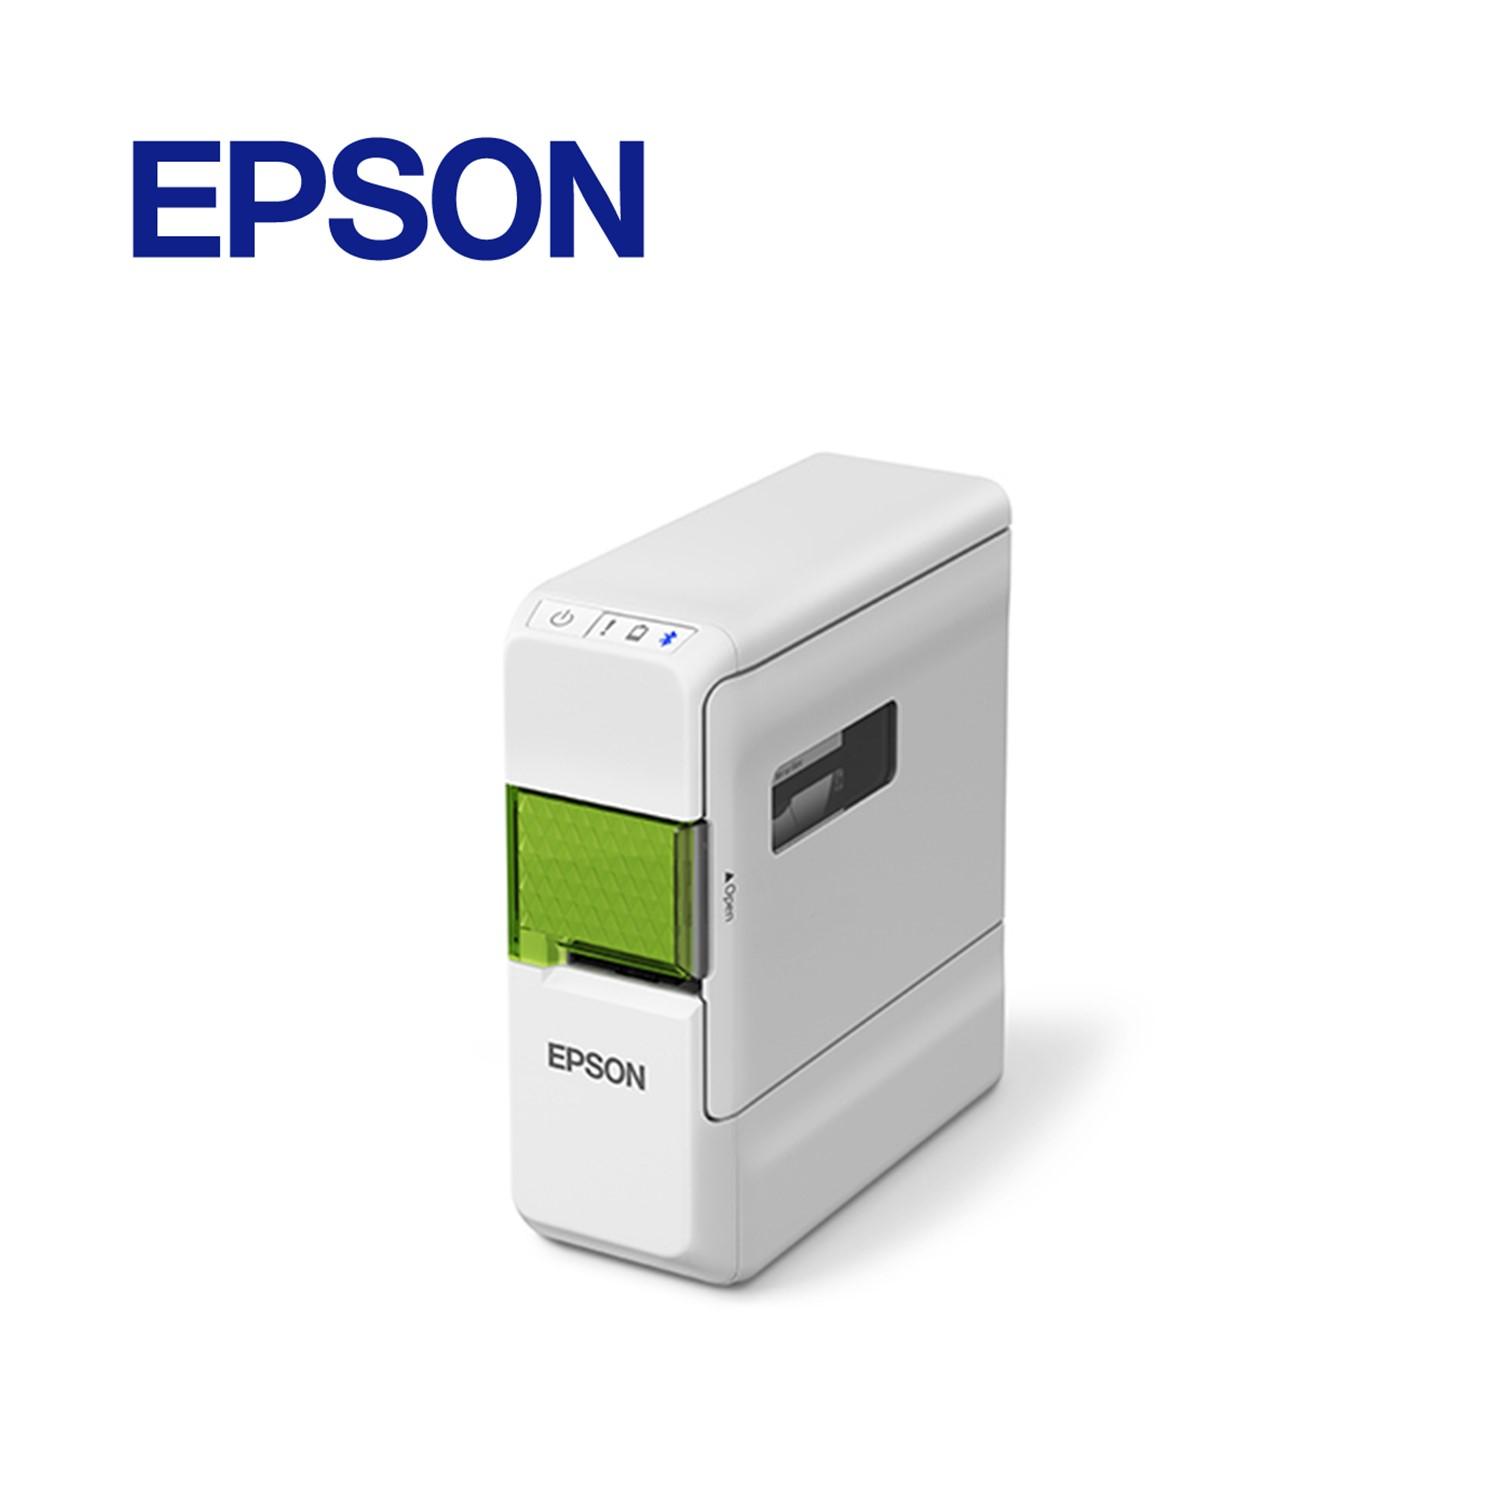 EPSON LW-C410 文創風藍芽手寫標籤機